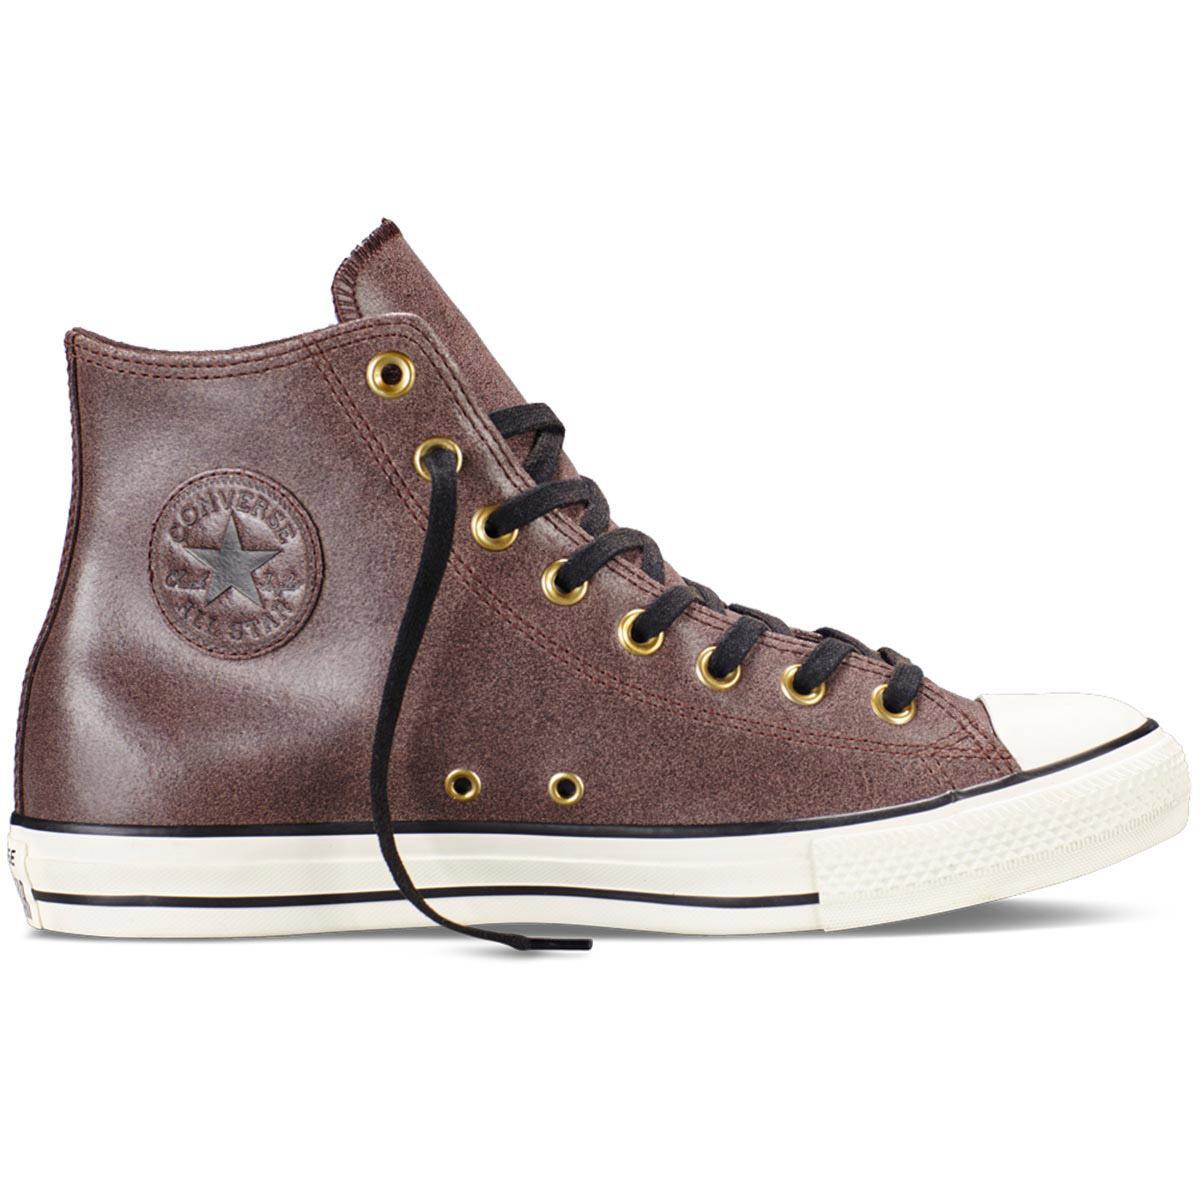 converse mens leather \u003e Clearance shop